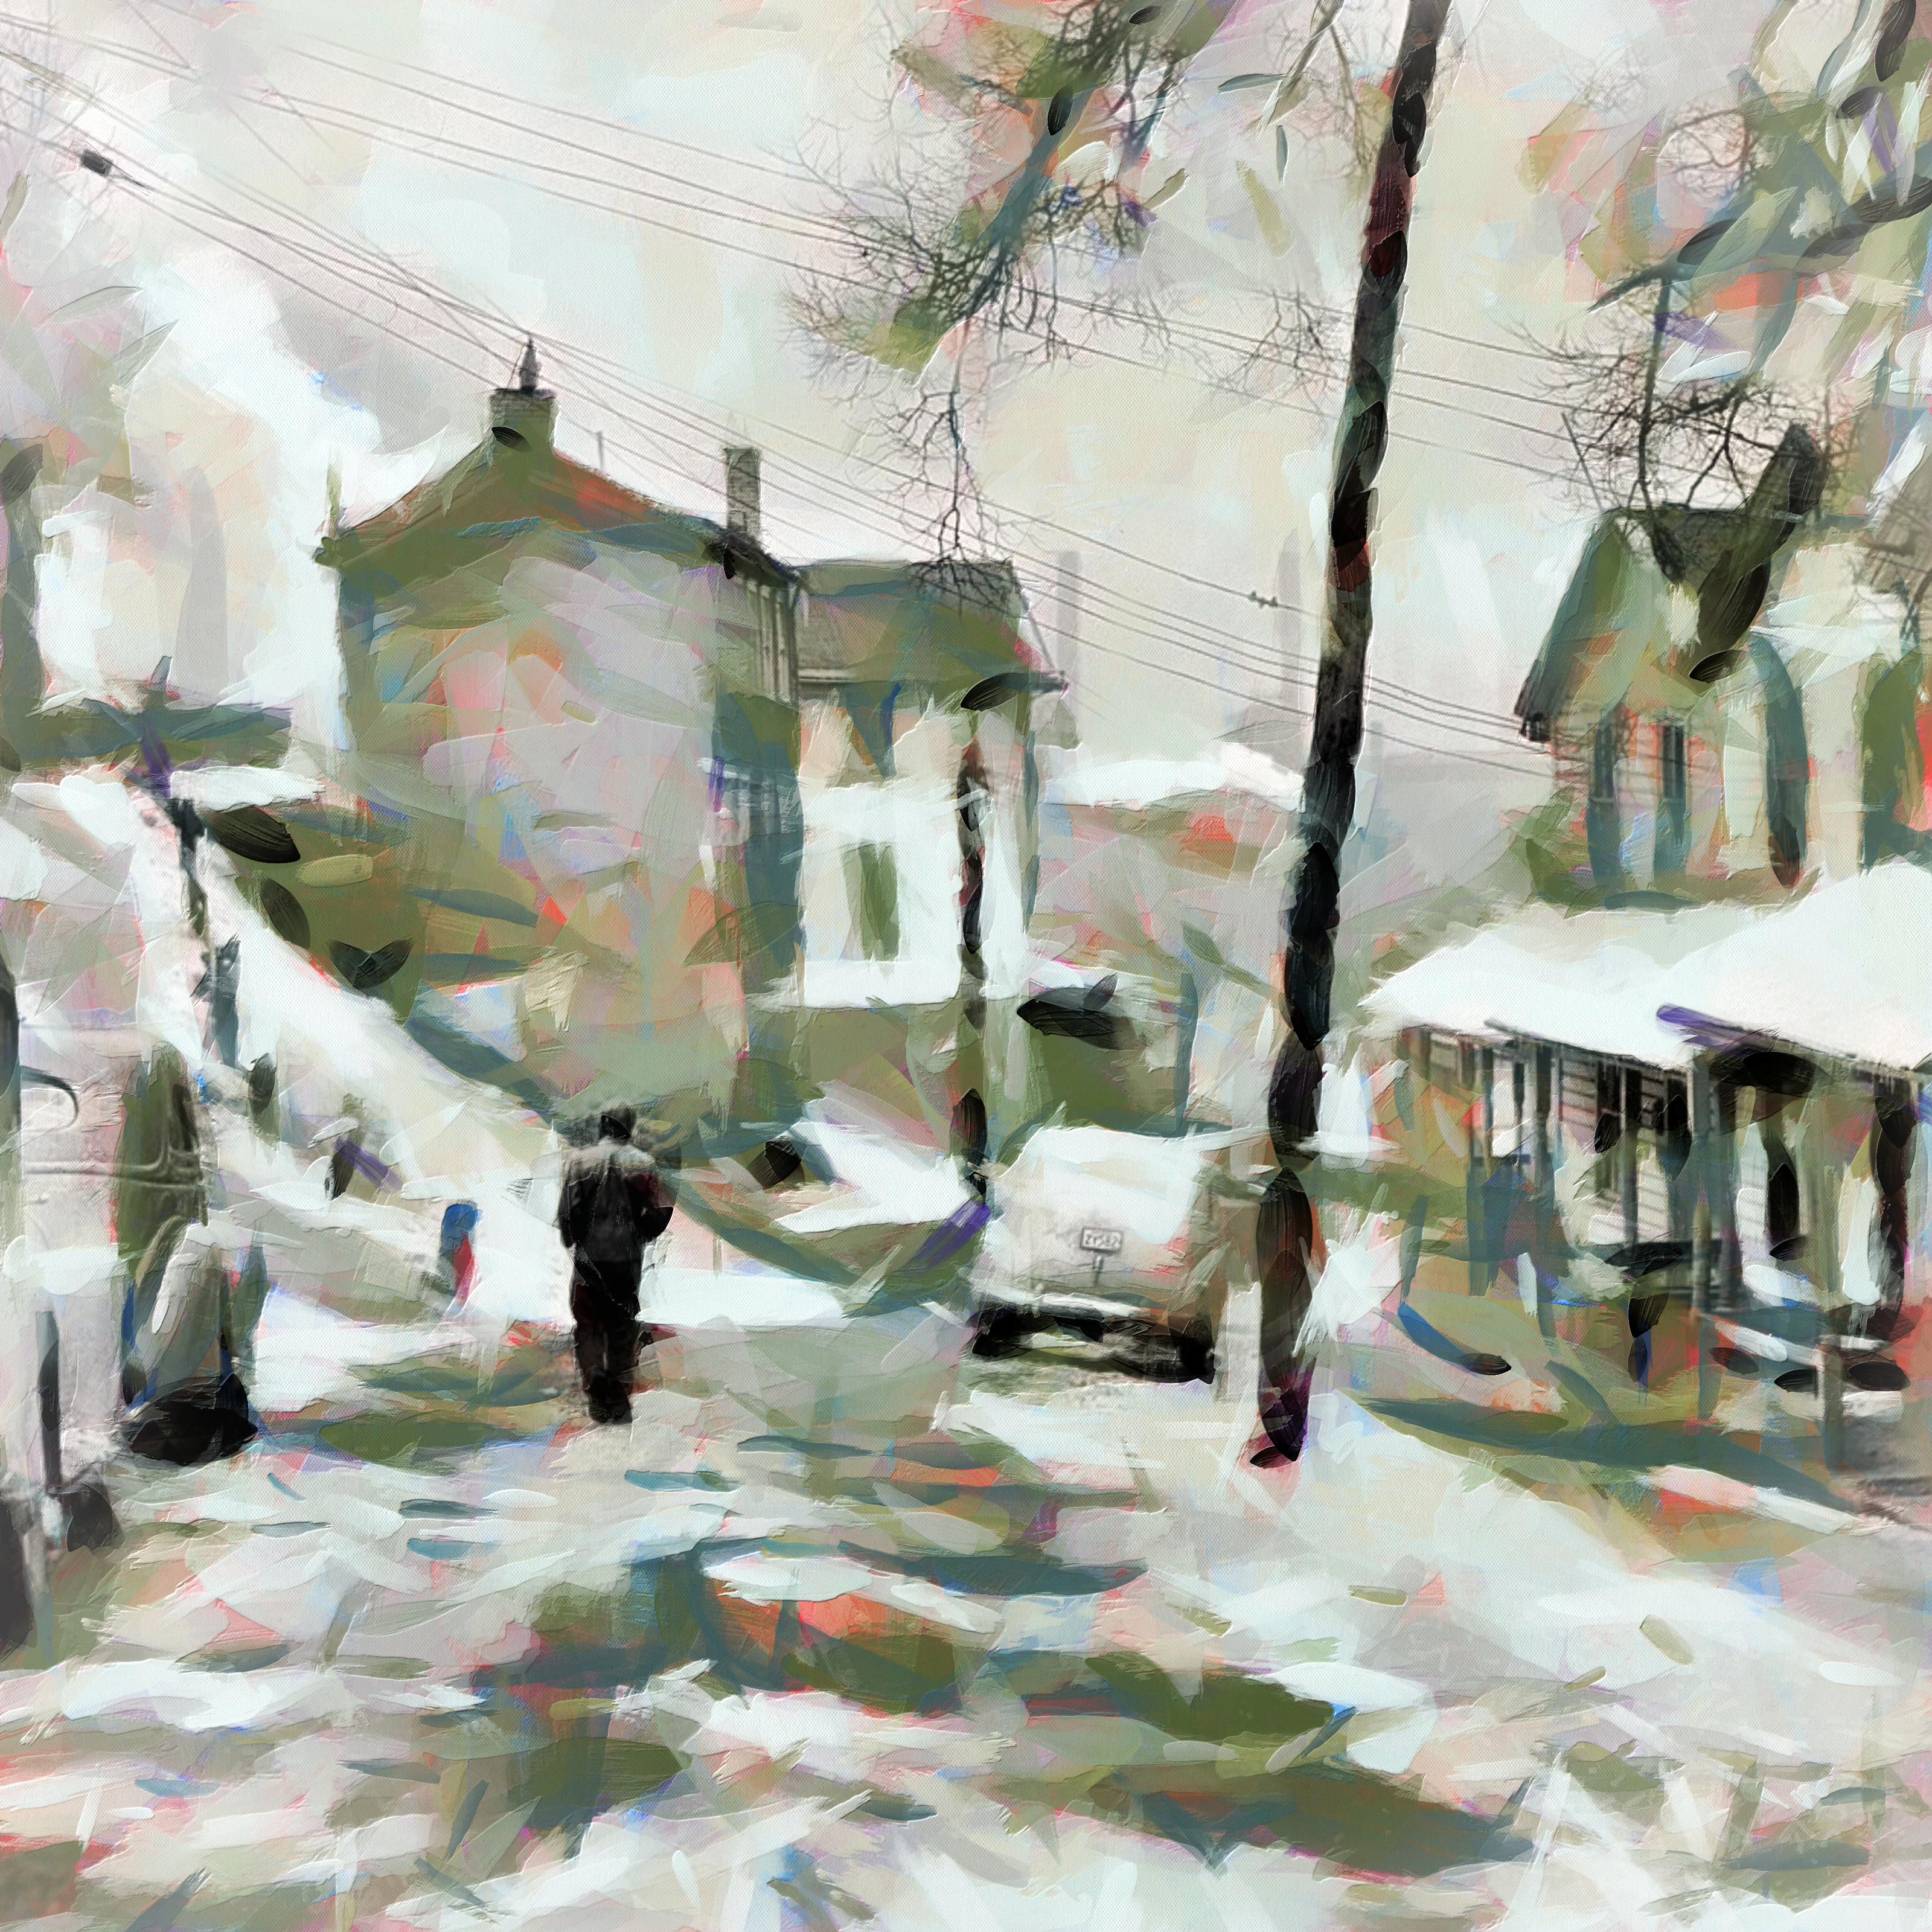 Street in Alquippa, Pennyslvania